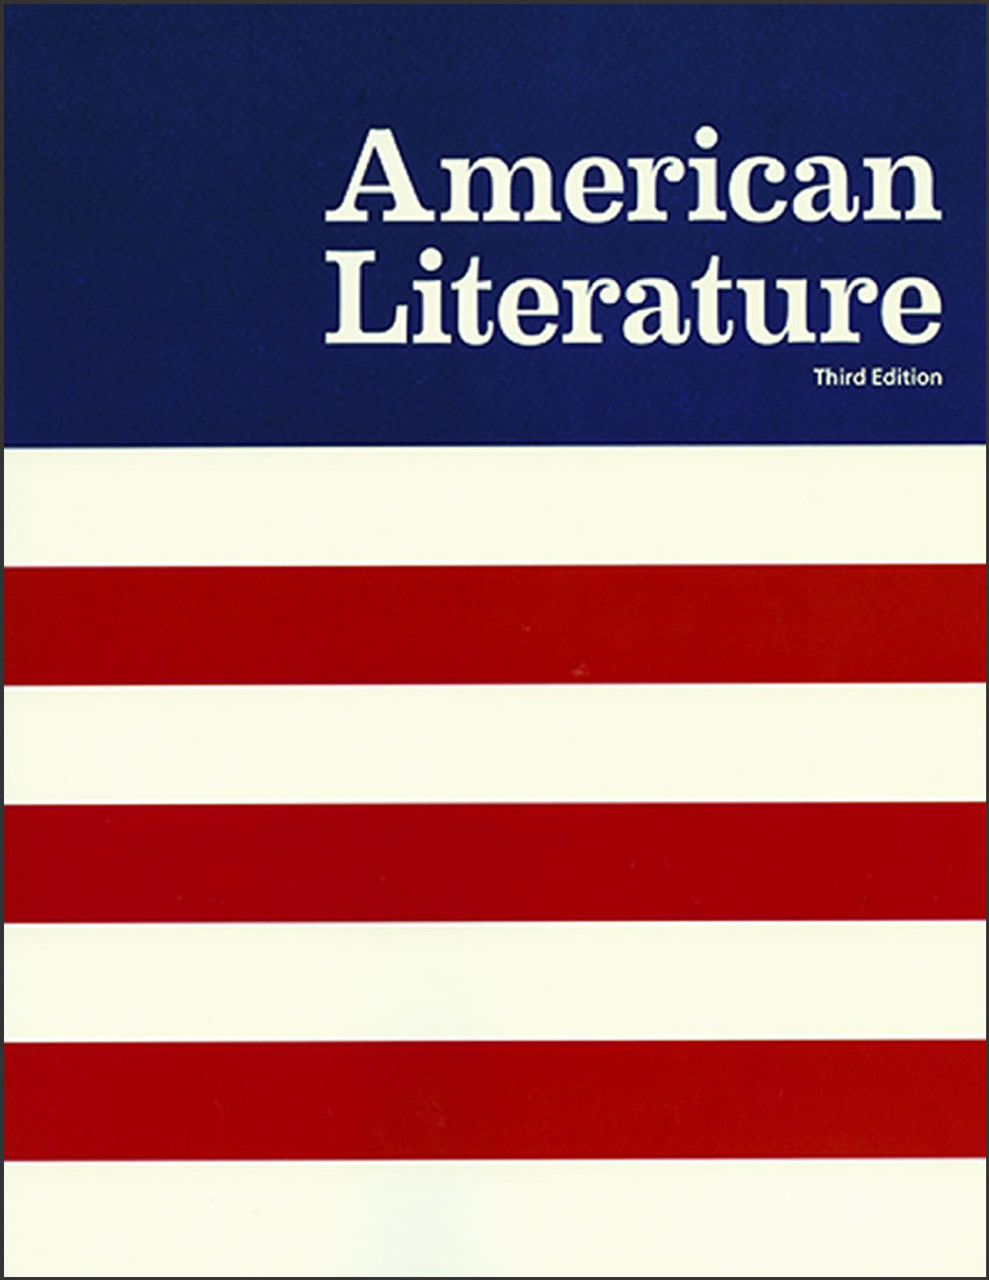 American Literature, 3rd edition (half)